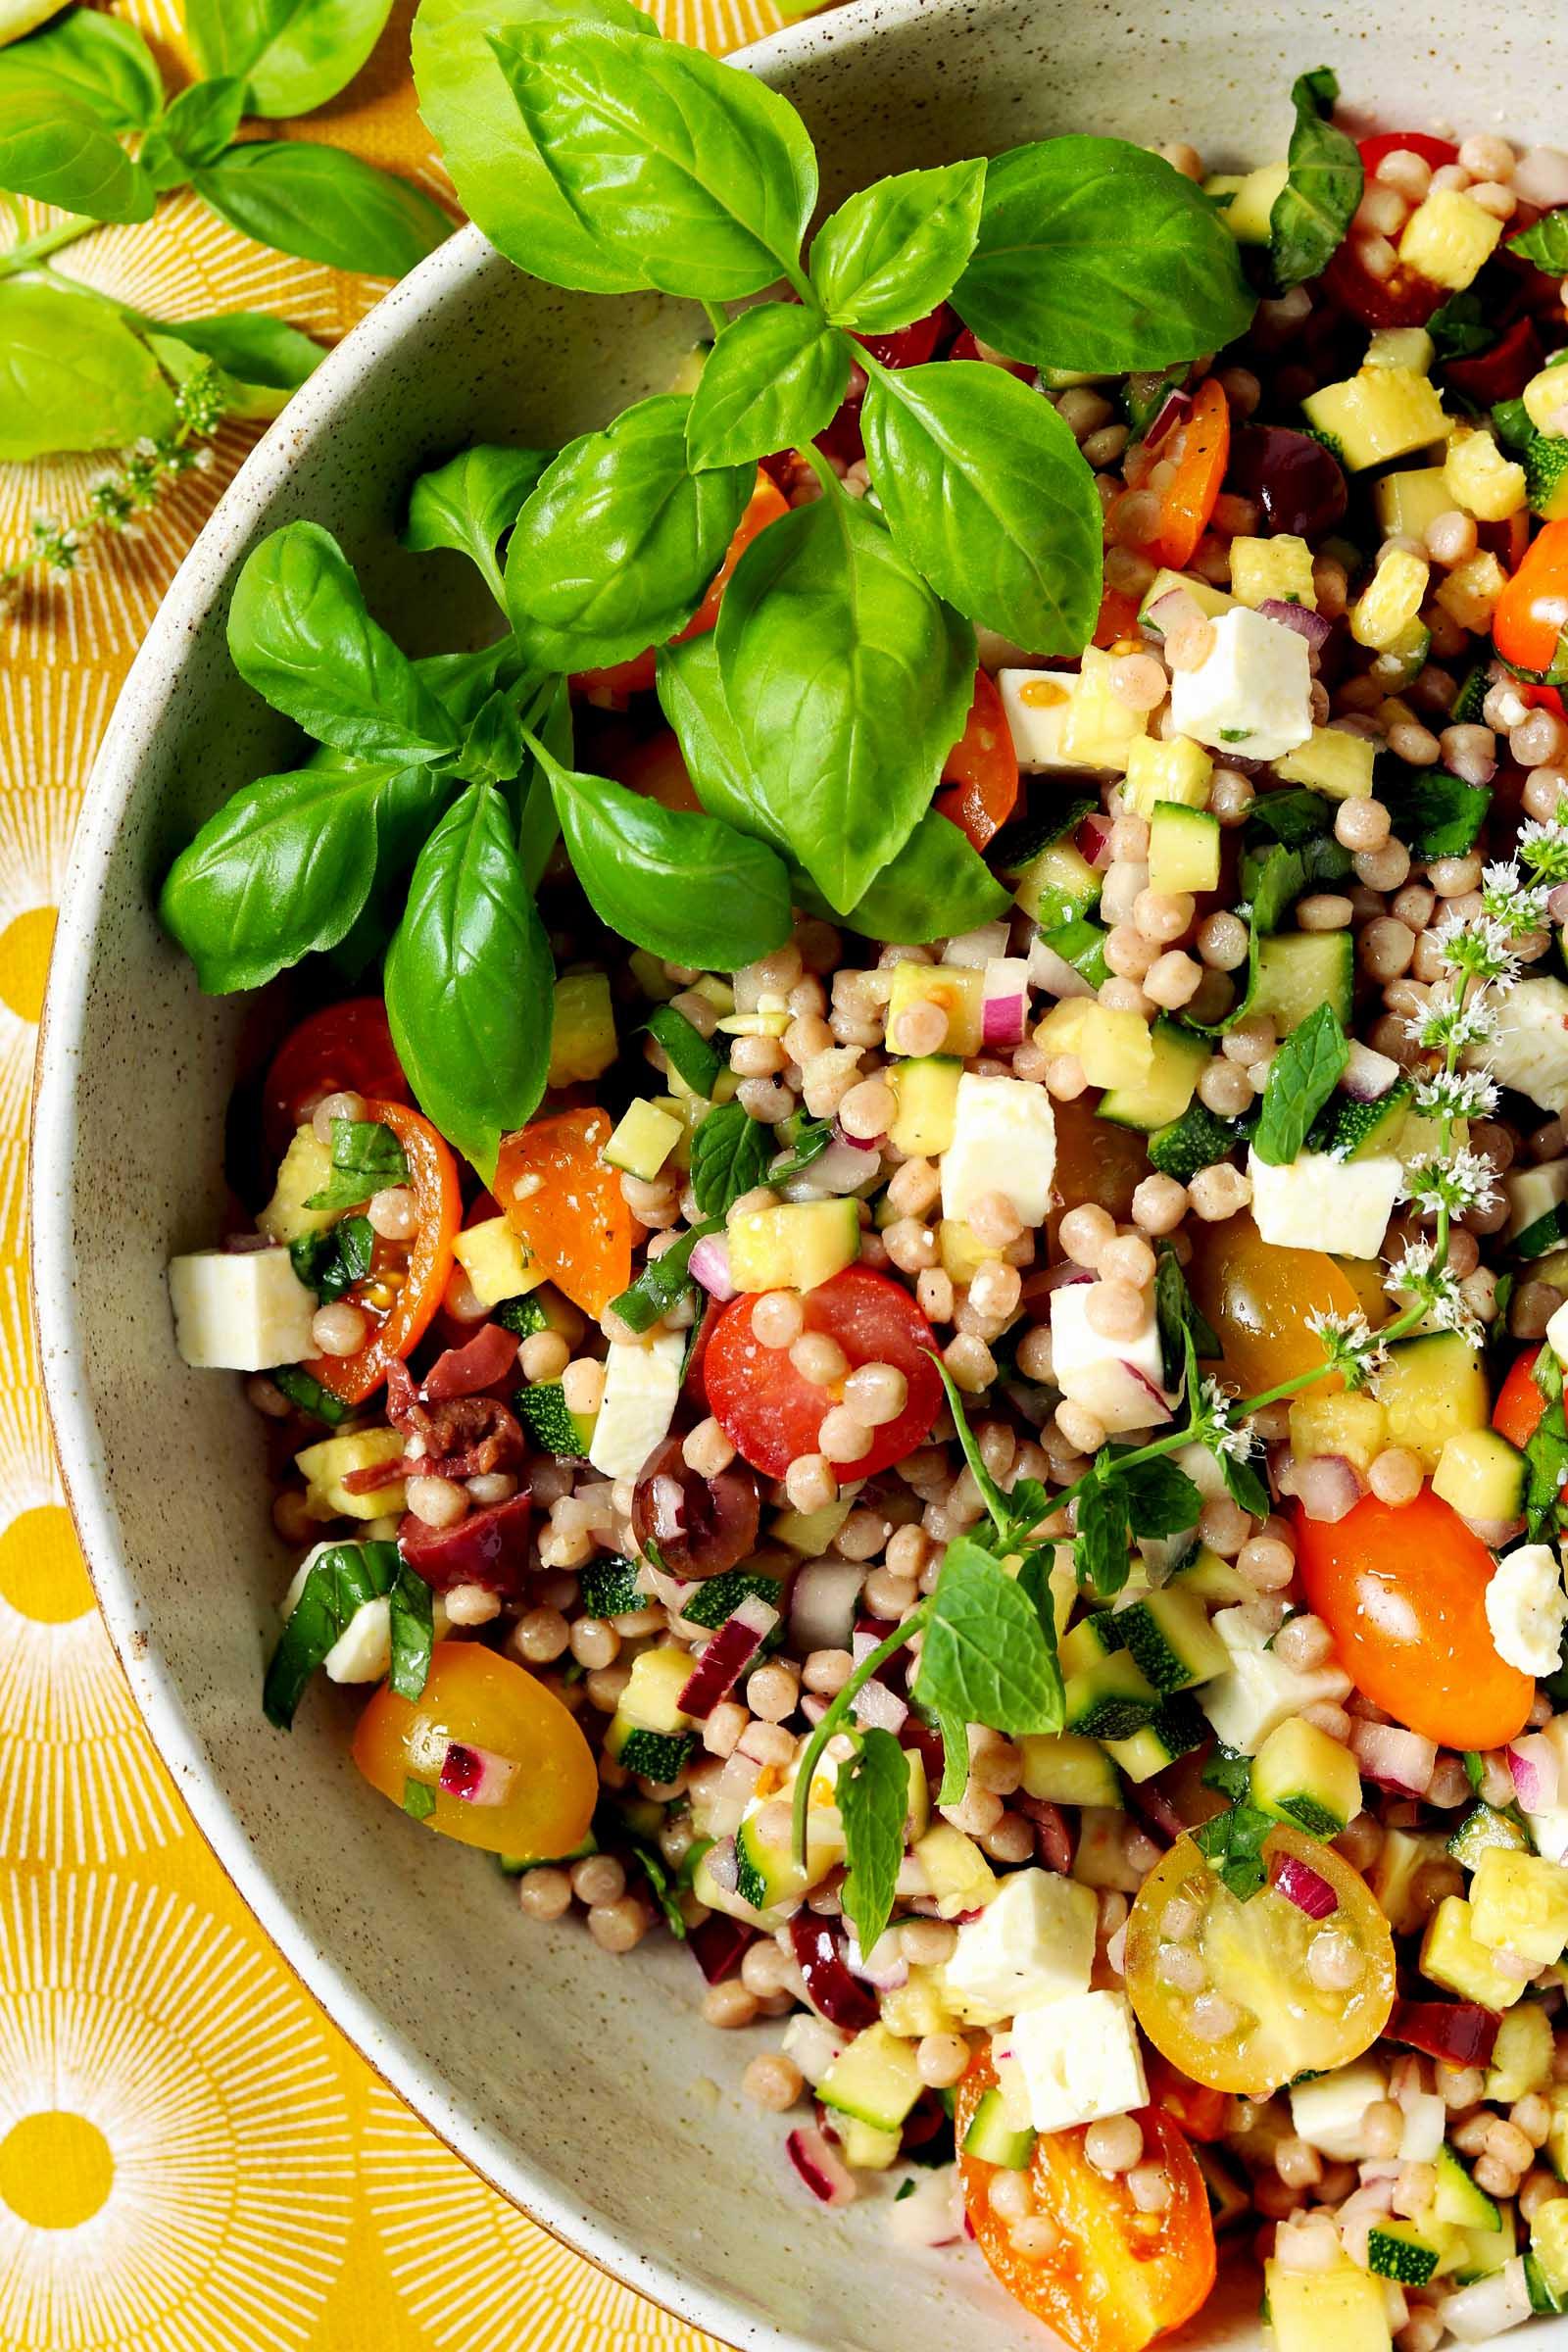 Mediterranean Couscous Salad - The Last Food Blog